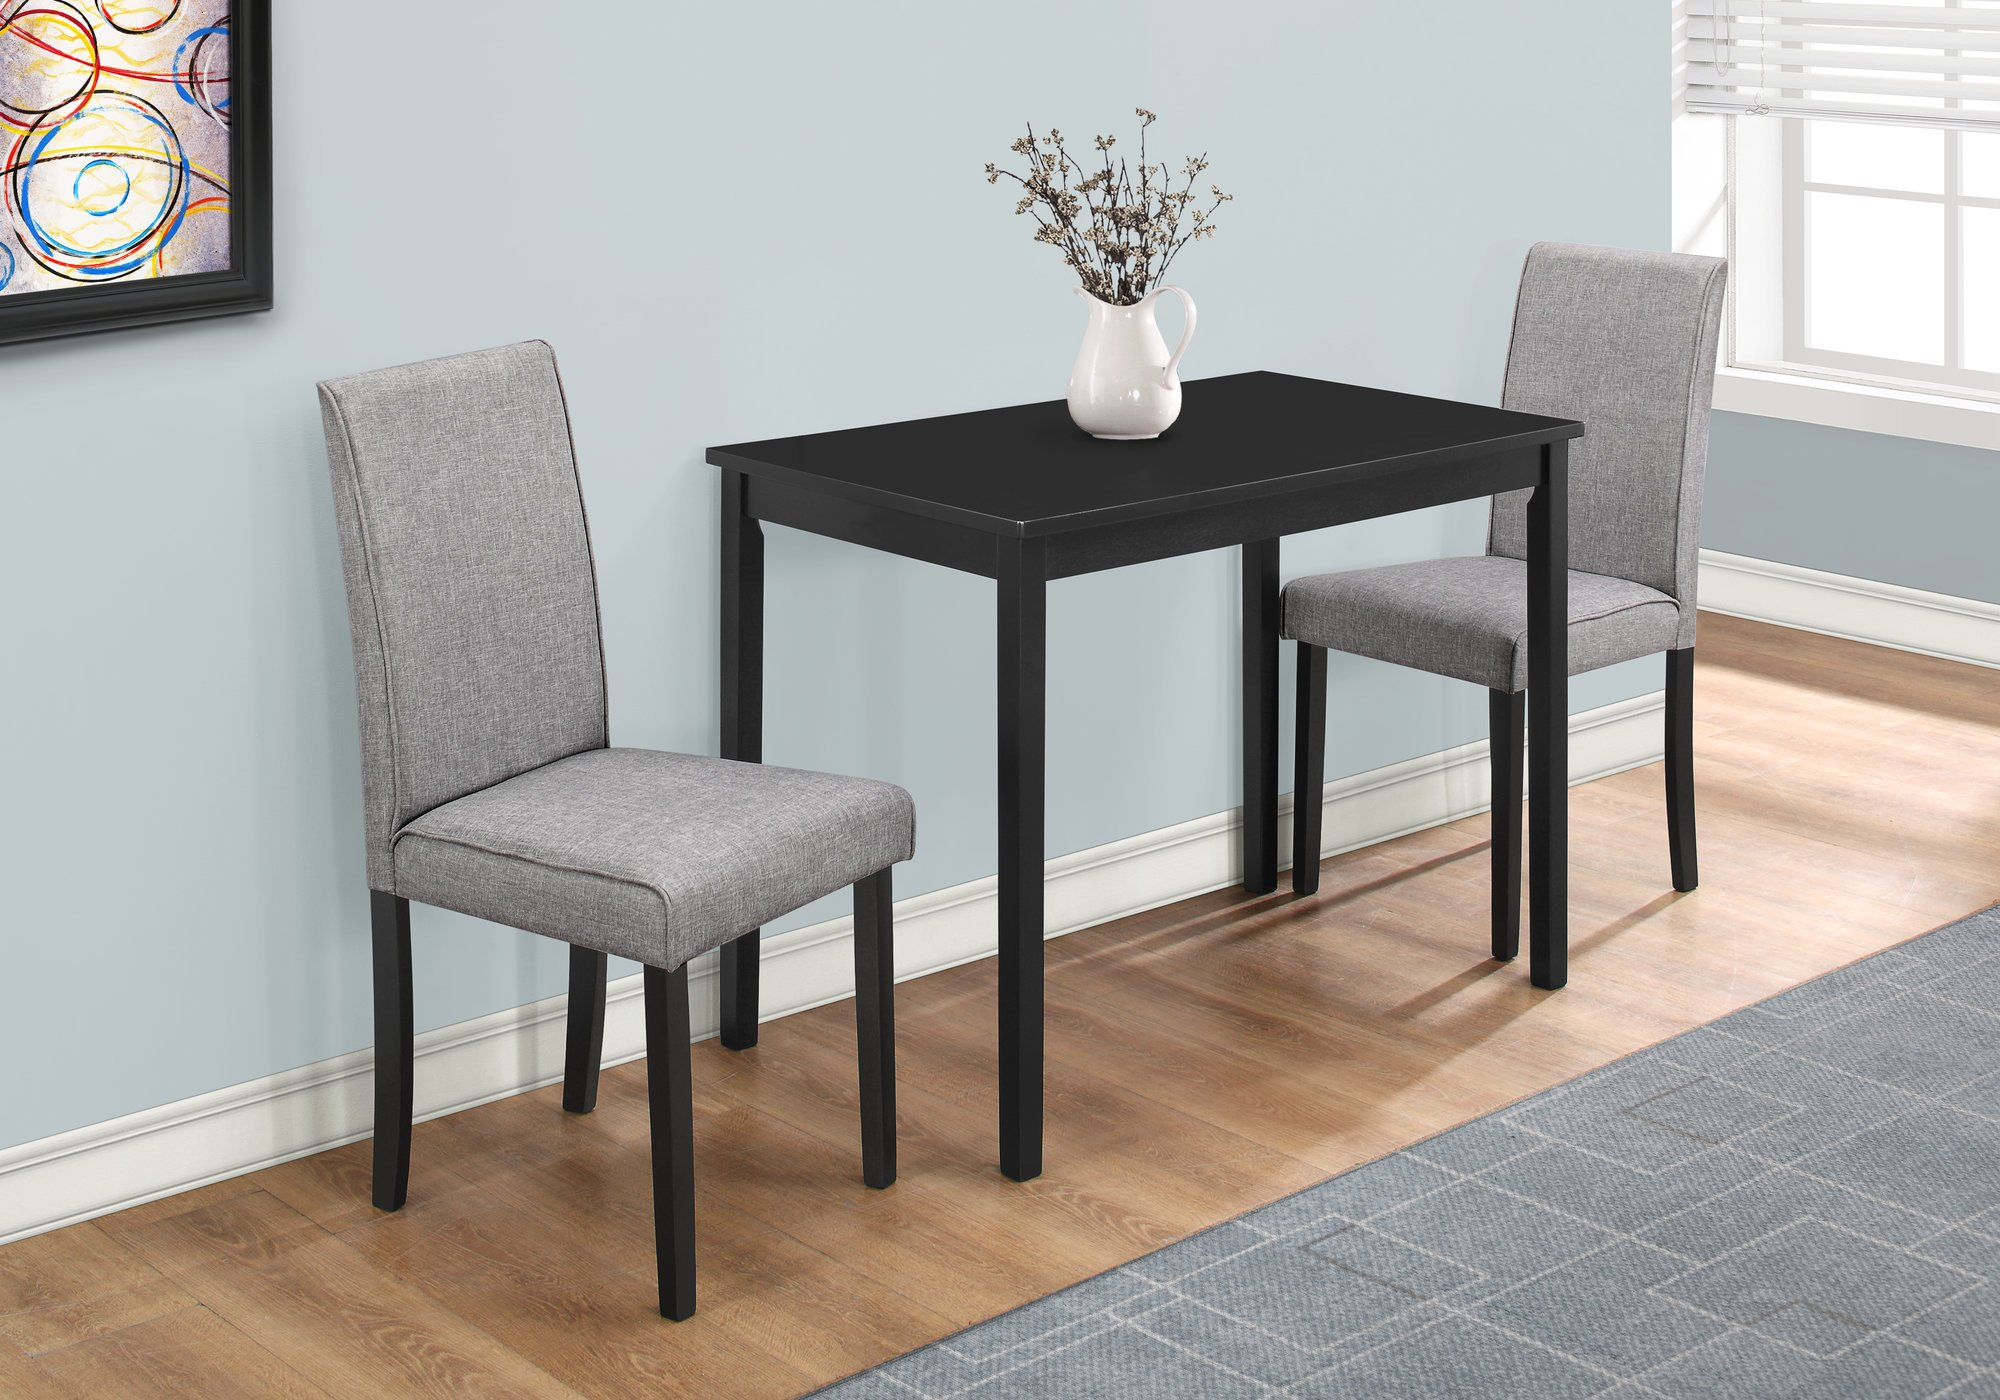 Monarch Specialties I 1016, Dining Set Set, Parson Chairs, Black/Grey, 3pcs